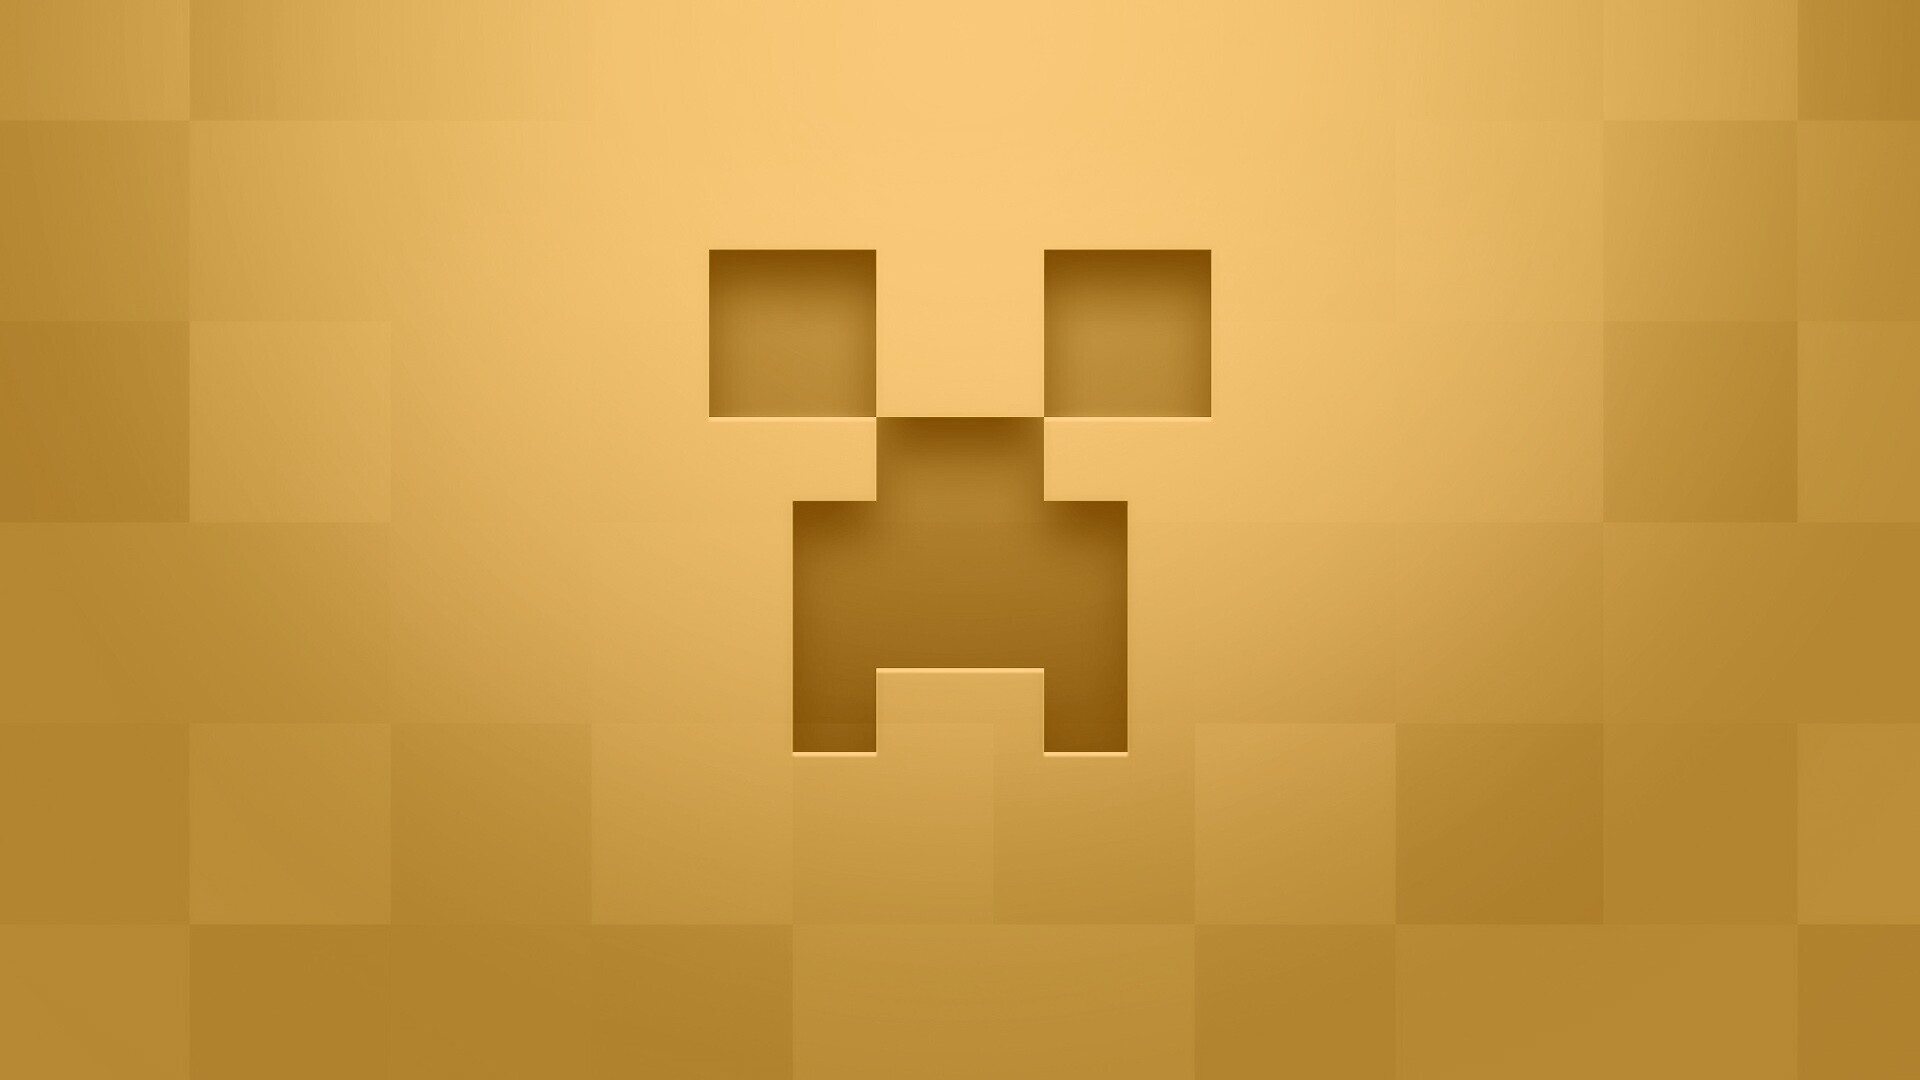 Minecraft Minimalist Desktop Wallpaper